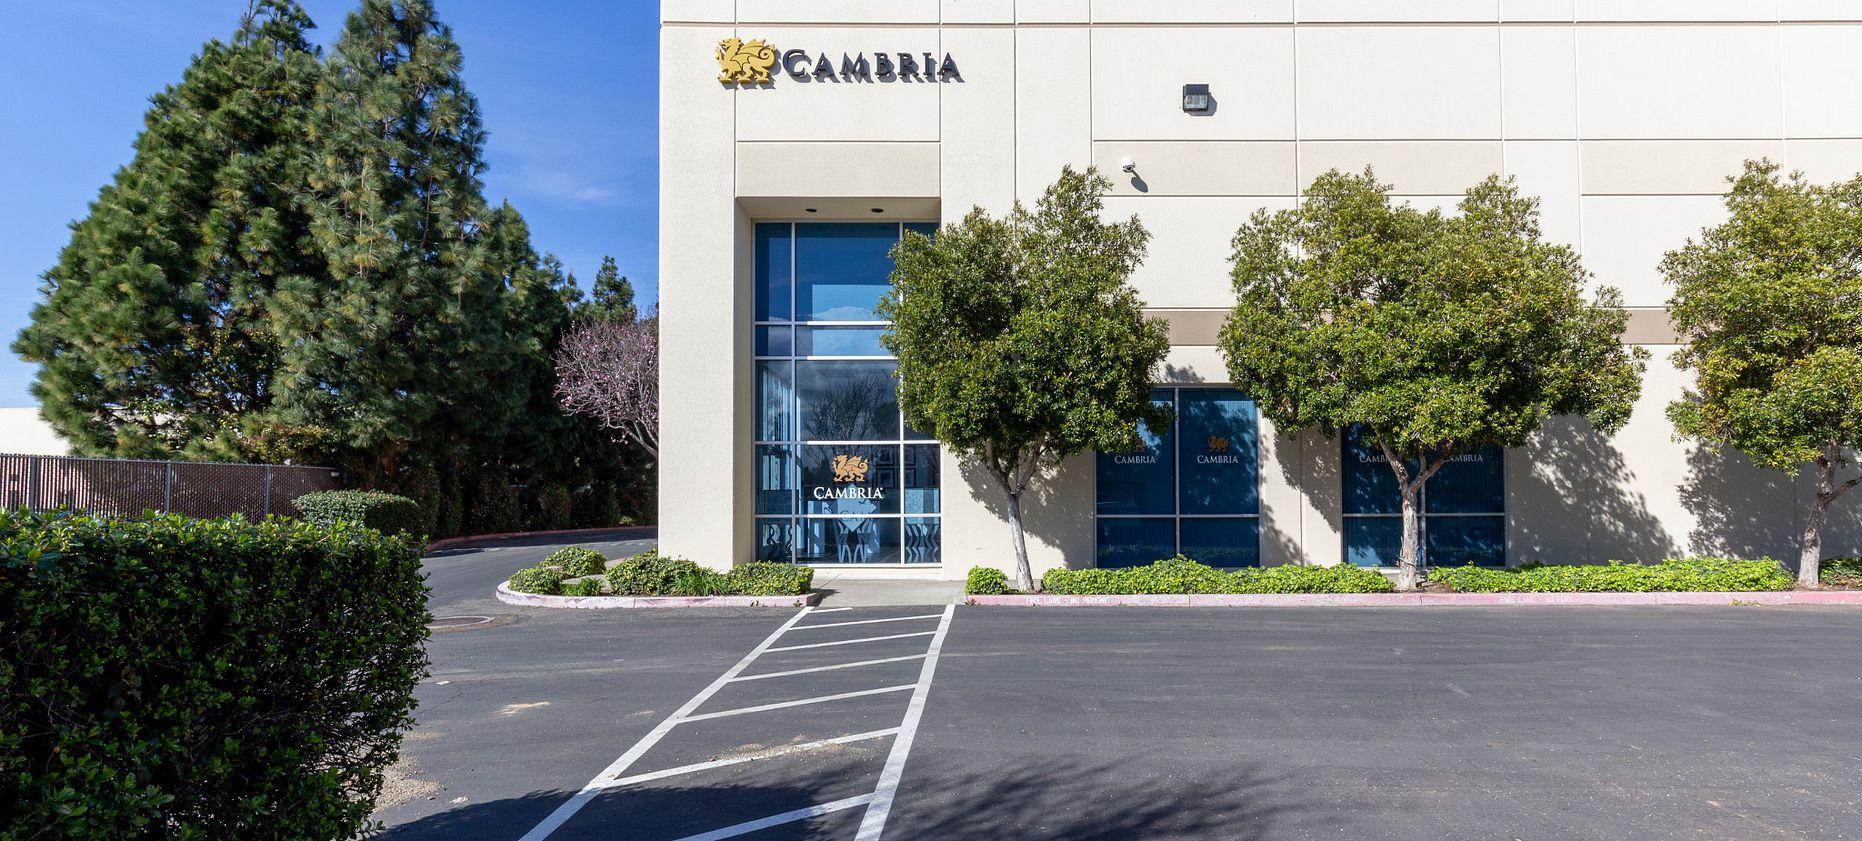 Cambria DC_San Francisco_Livingtston_002_19 copy.jpg